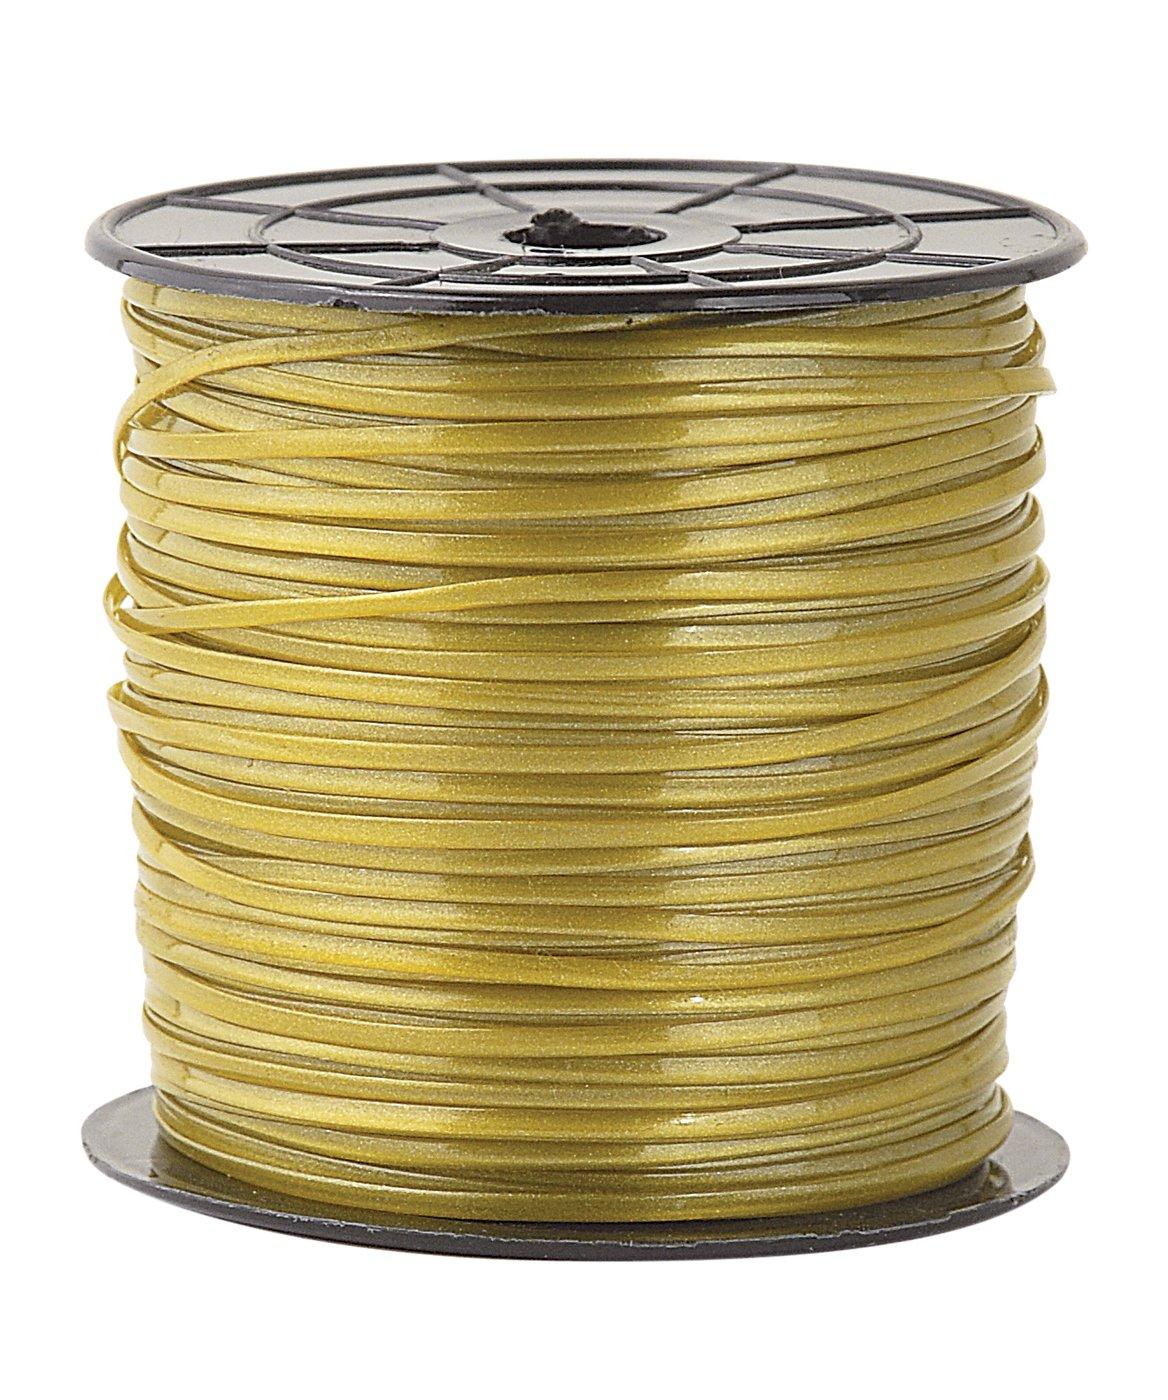 Toner Crafts Gold 100 YD Spool